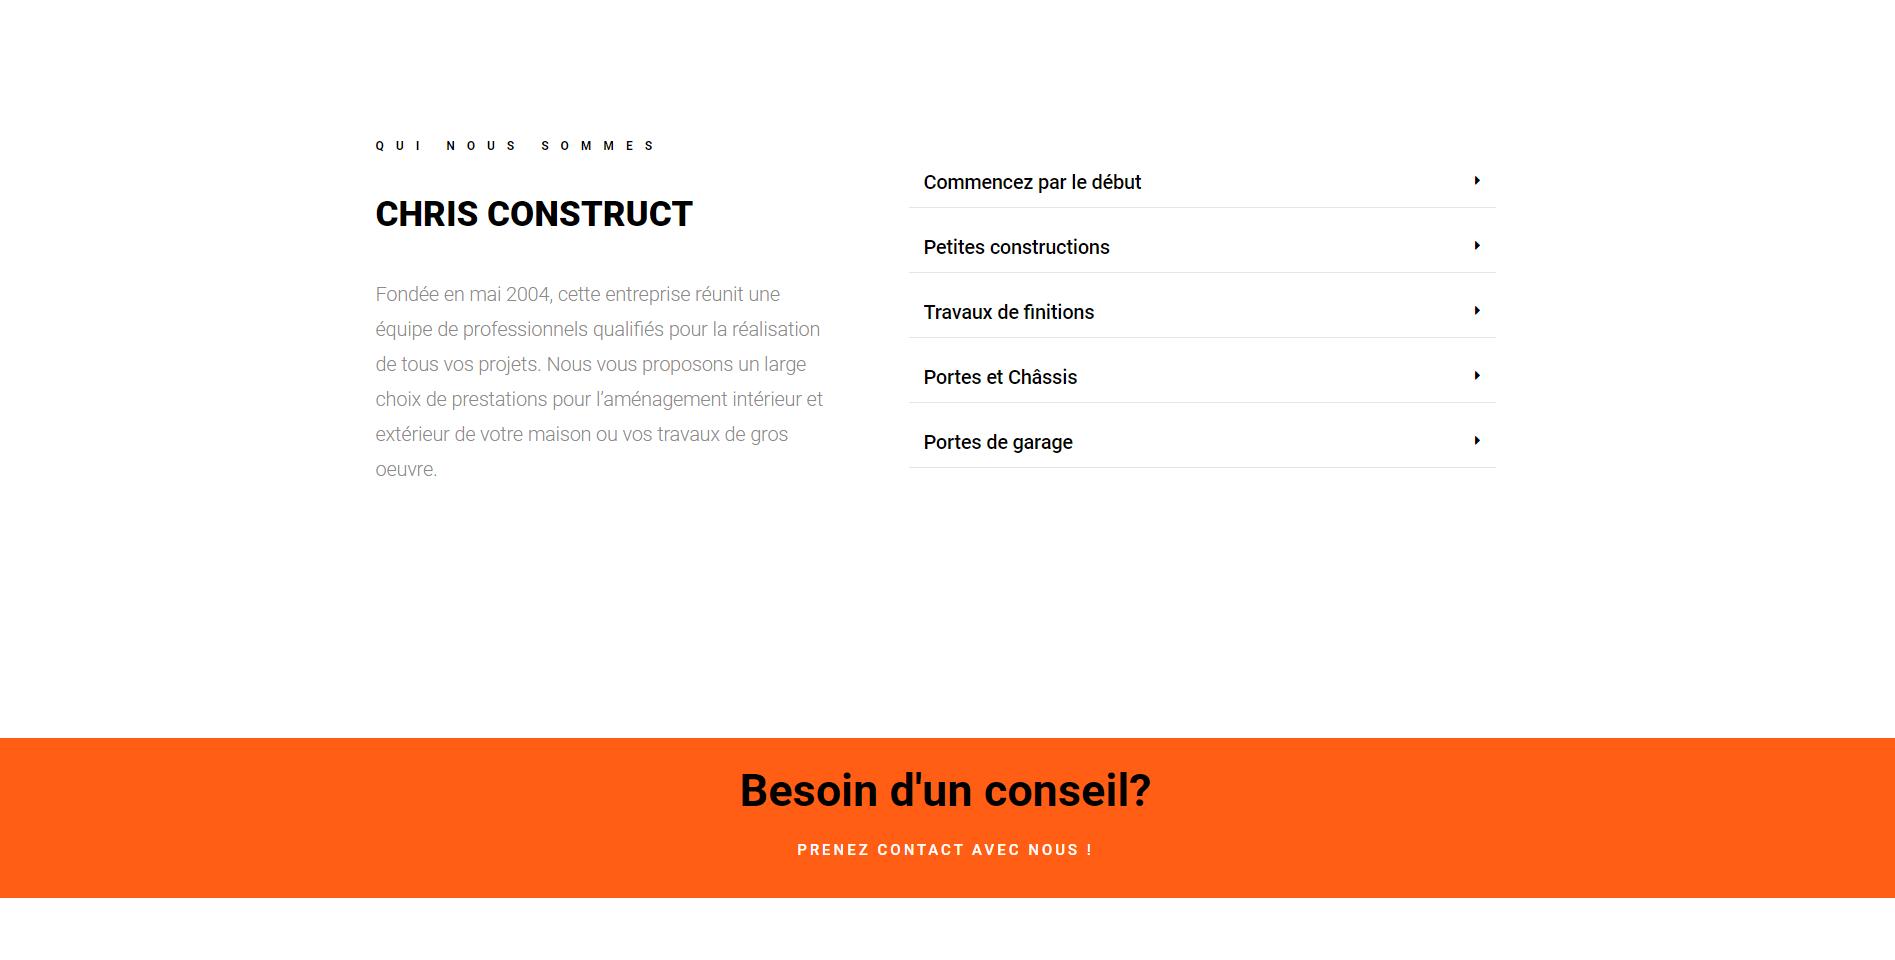 chris-construct3